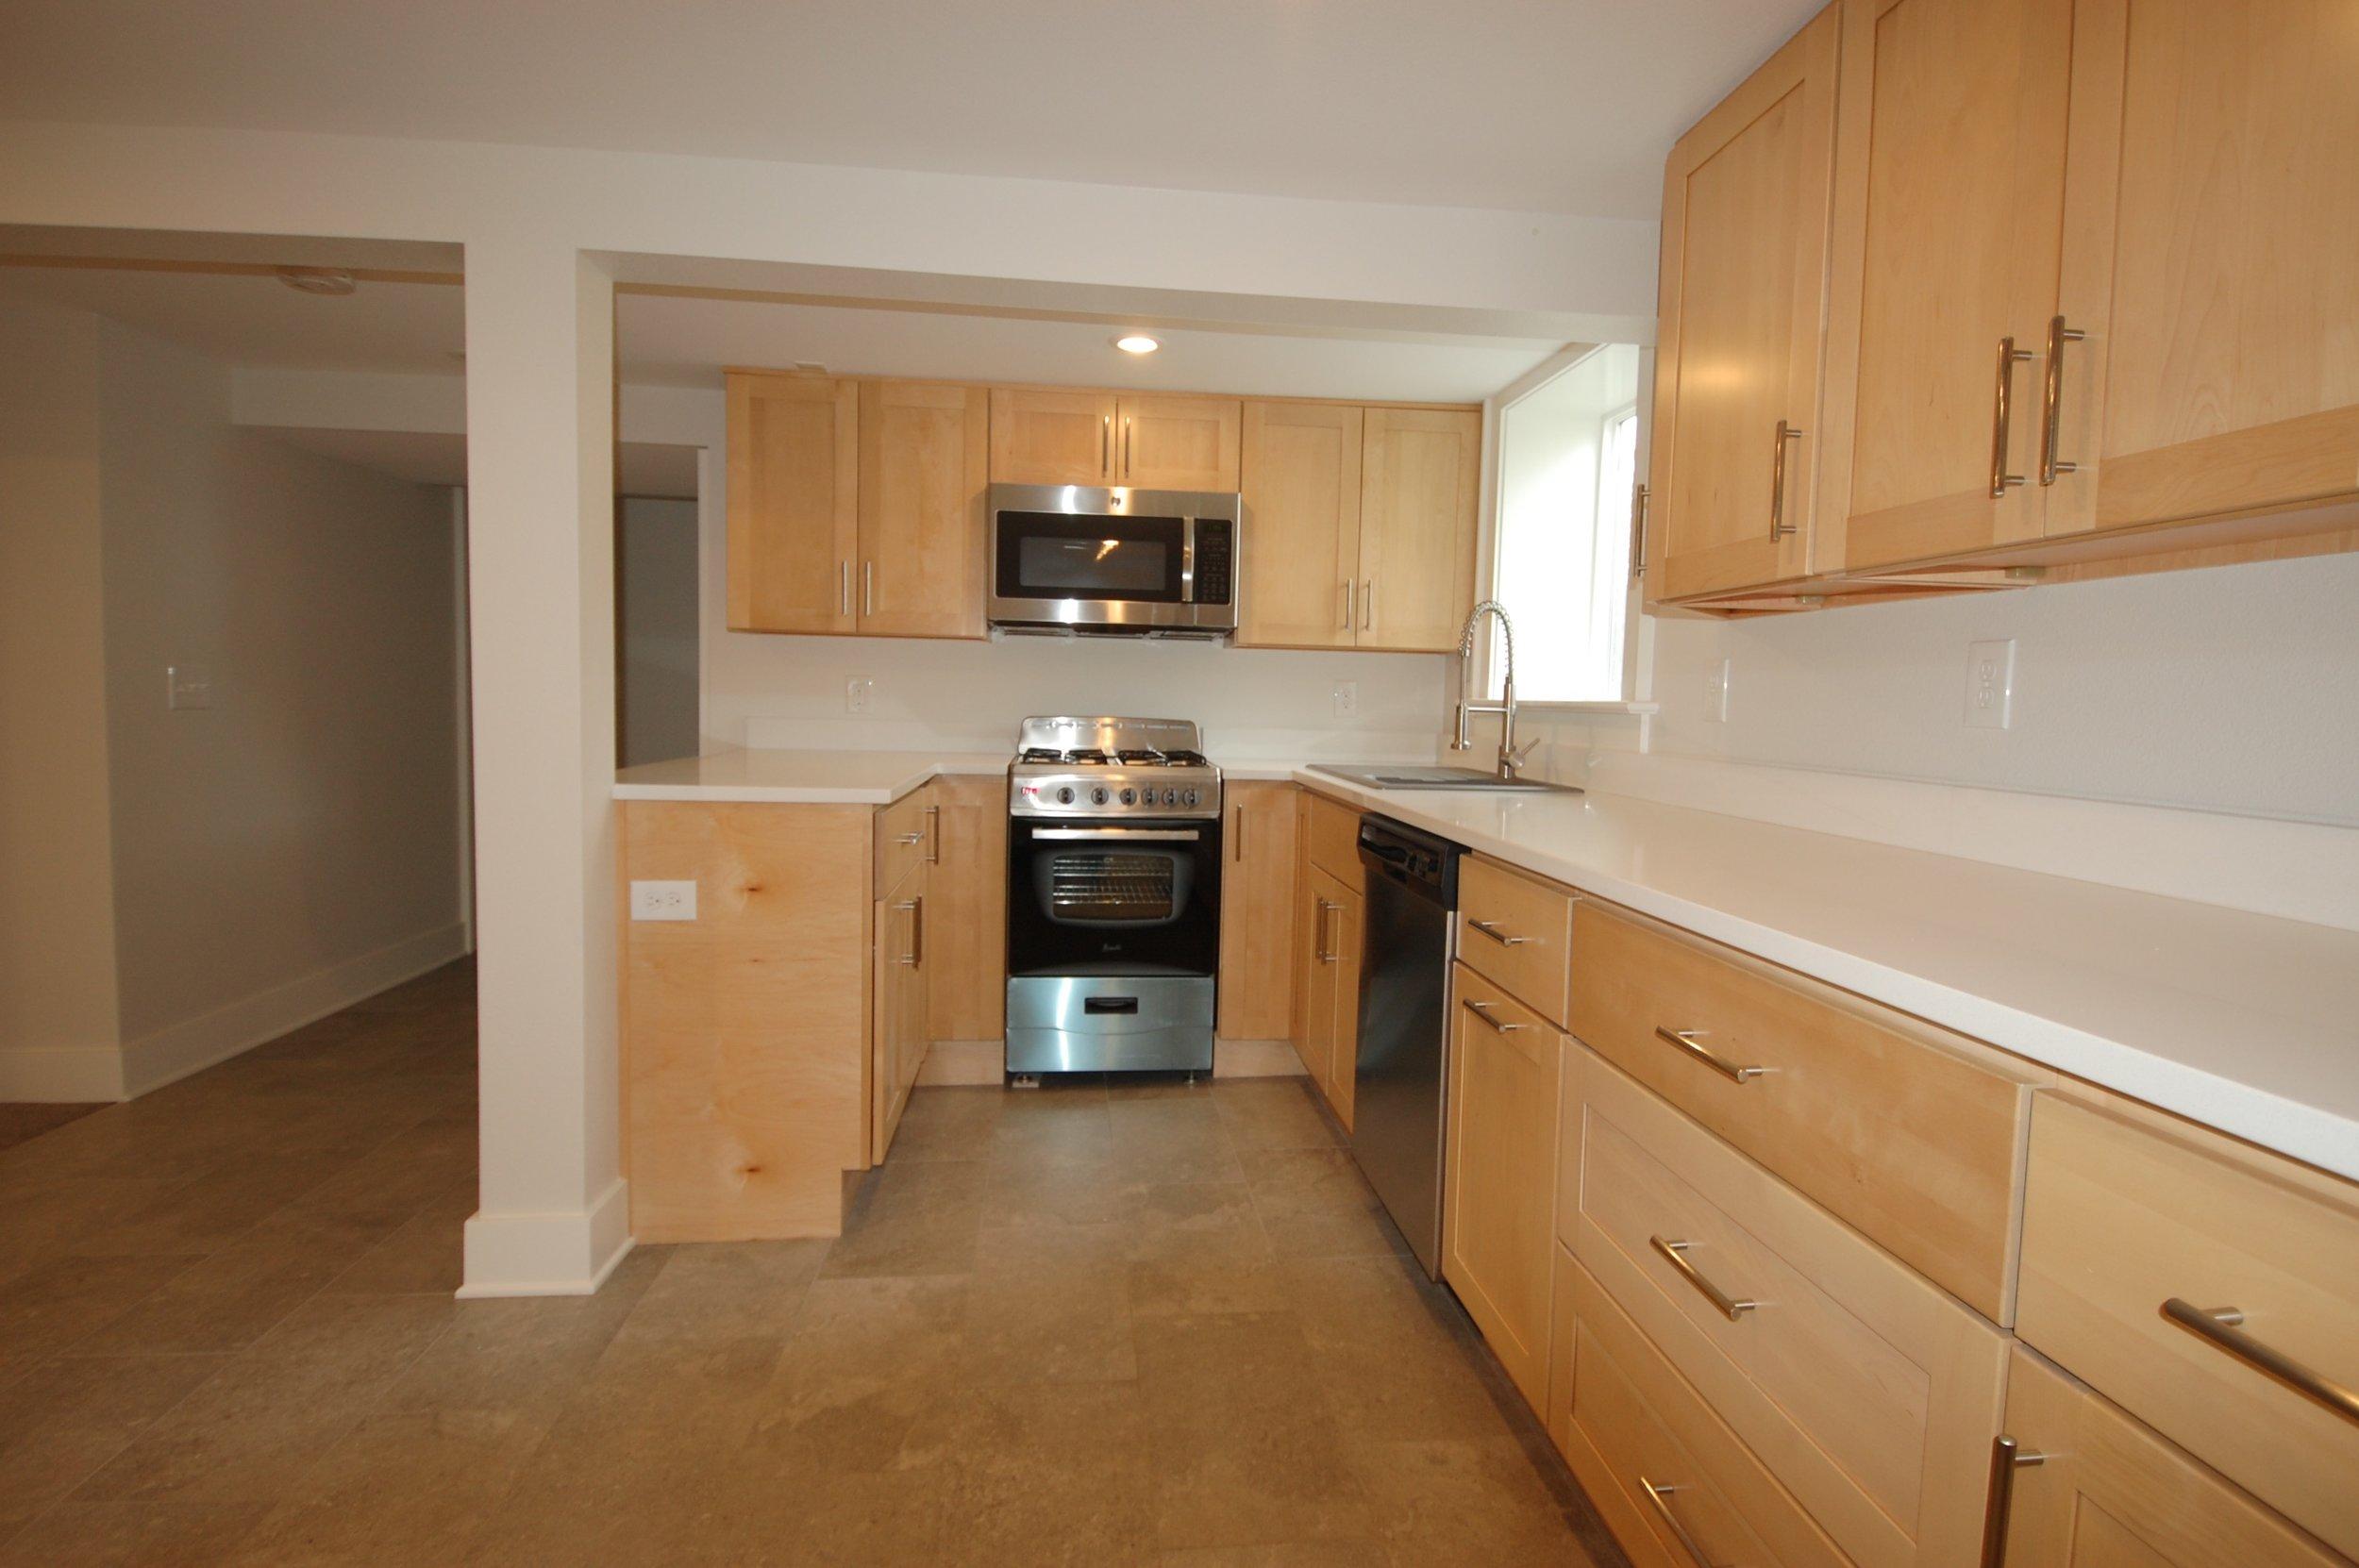 Smith_Hayes_Brothers_Construction_ADU_Basement_Kitchen_1b.jpg